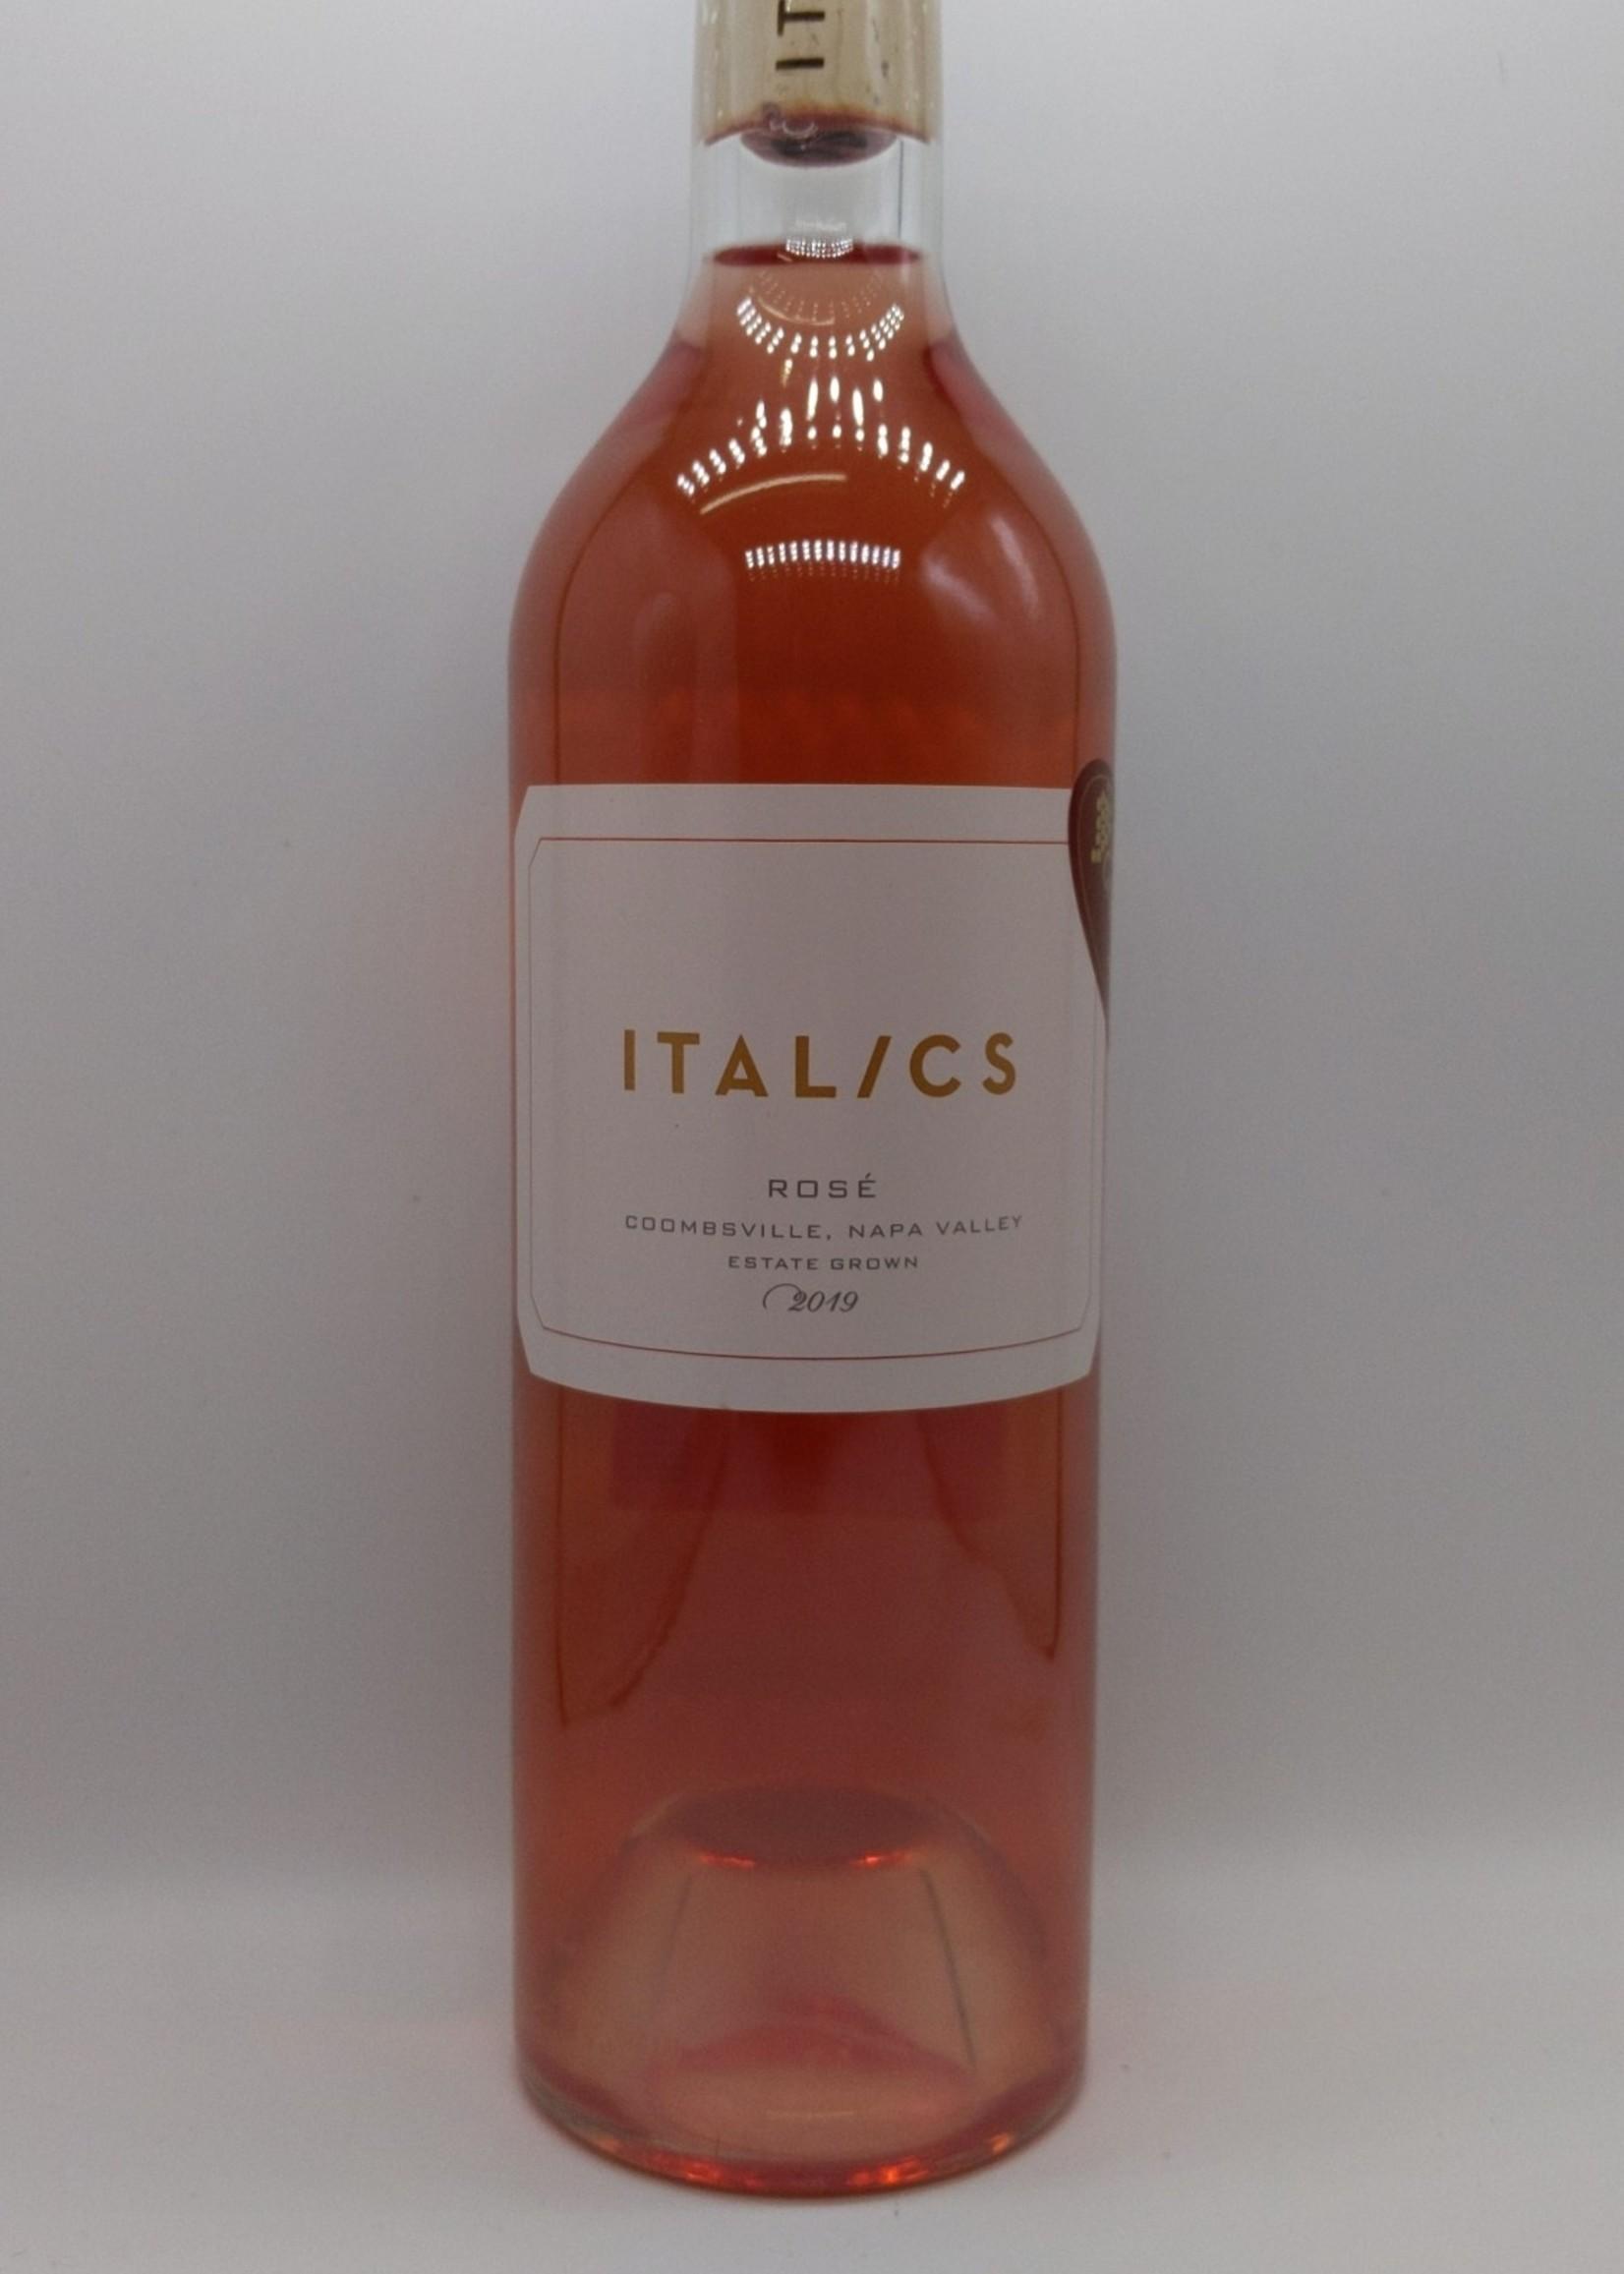 2019 ITALICS ROSE 750ml